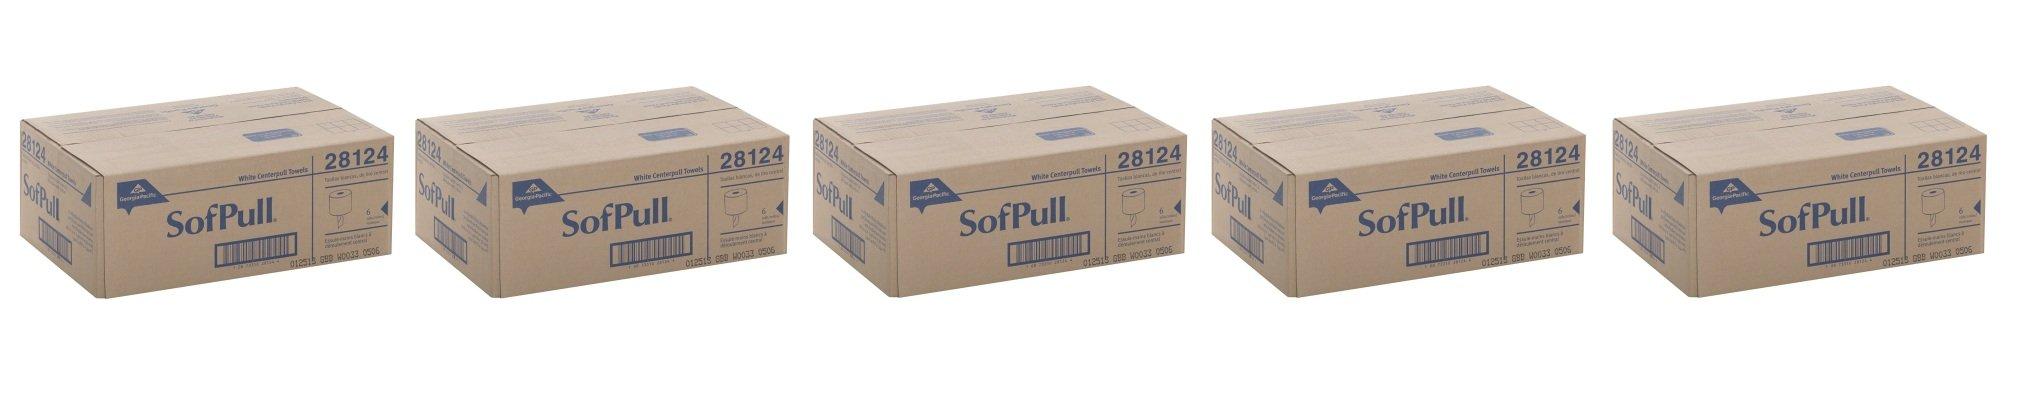 Georgia-Pacific SofPull 28124 White MVmtOU Premium 1-Ply Regular Capacity Centerpull Paper Towel, 5Pack (6 Rolls)